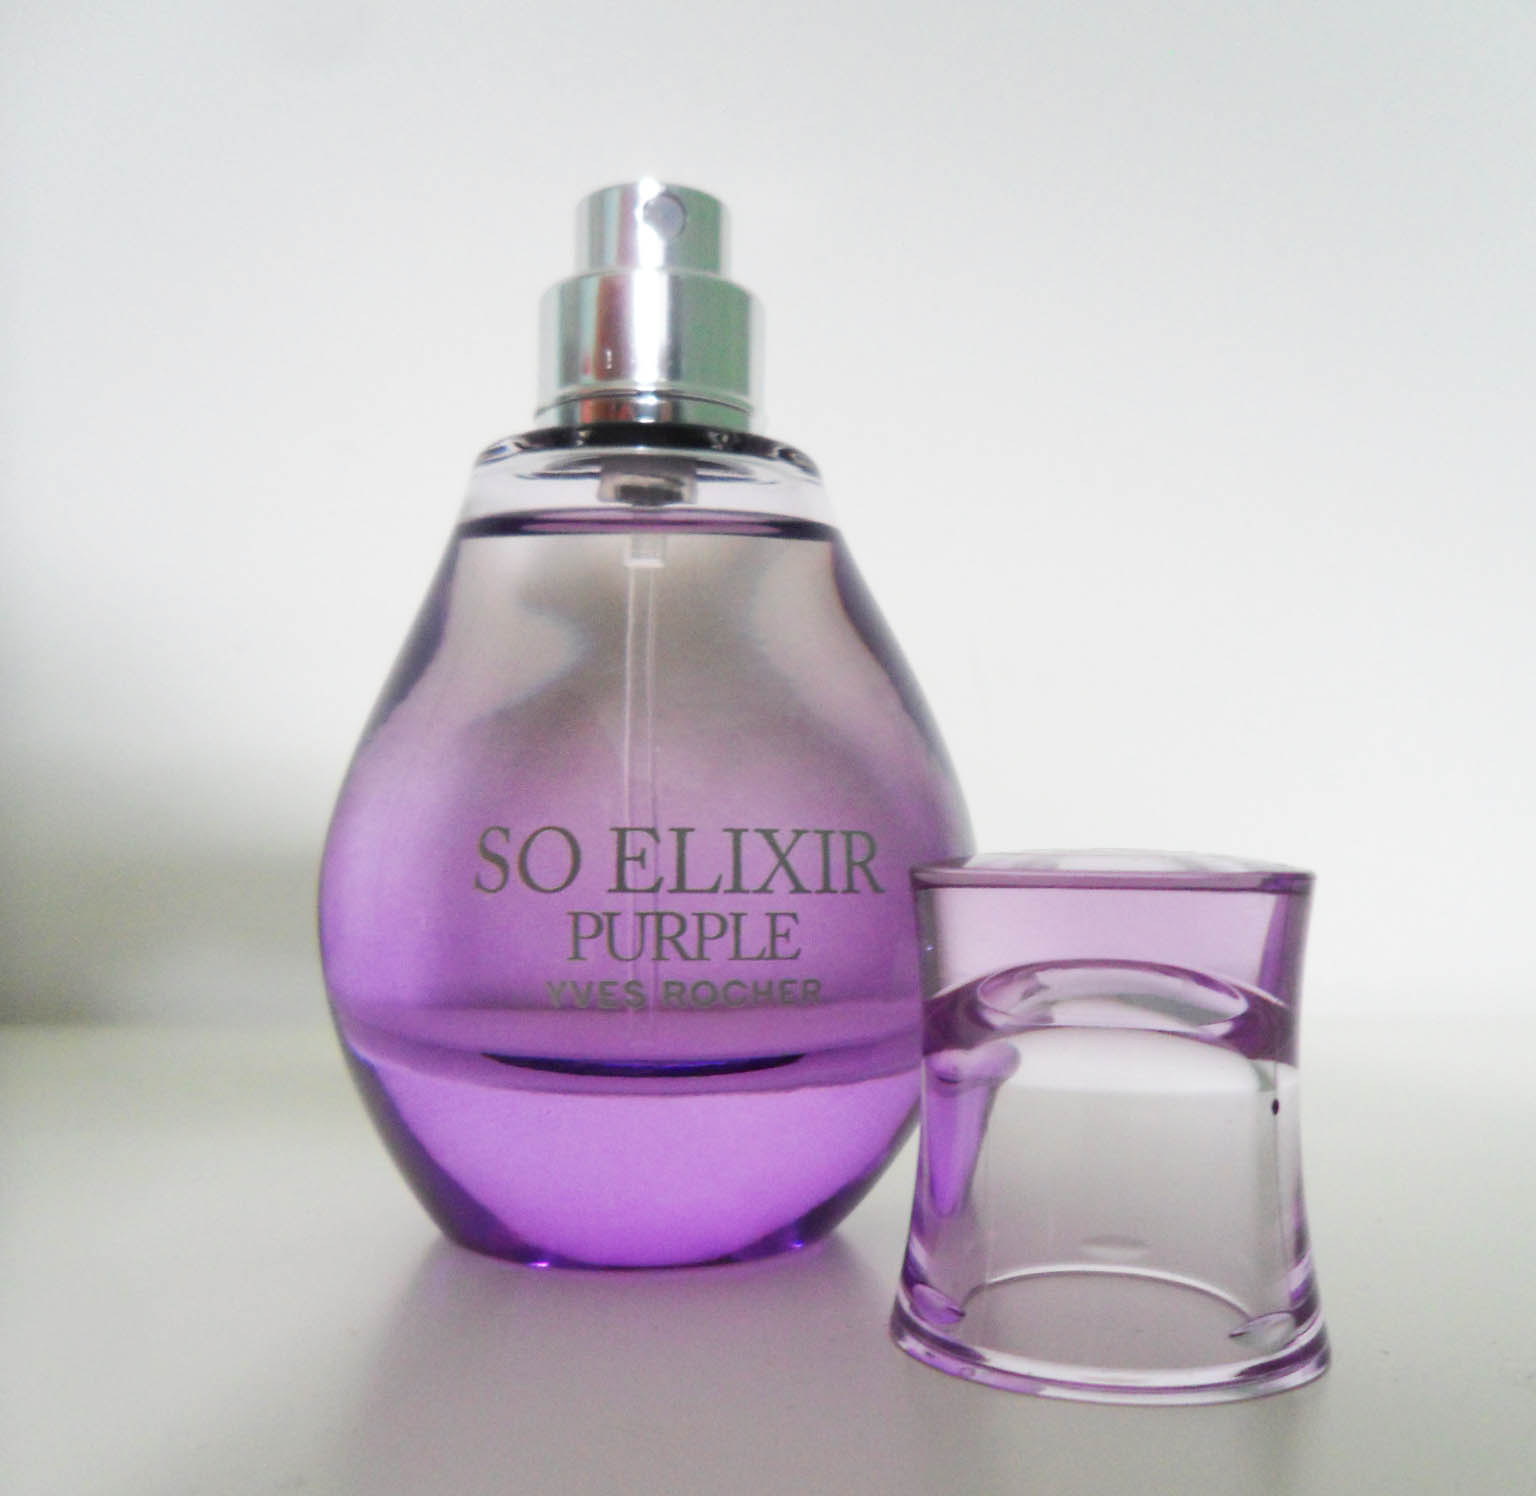 So so Elixir Parfum Femme Elixir qVSzMpGU